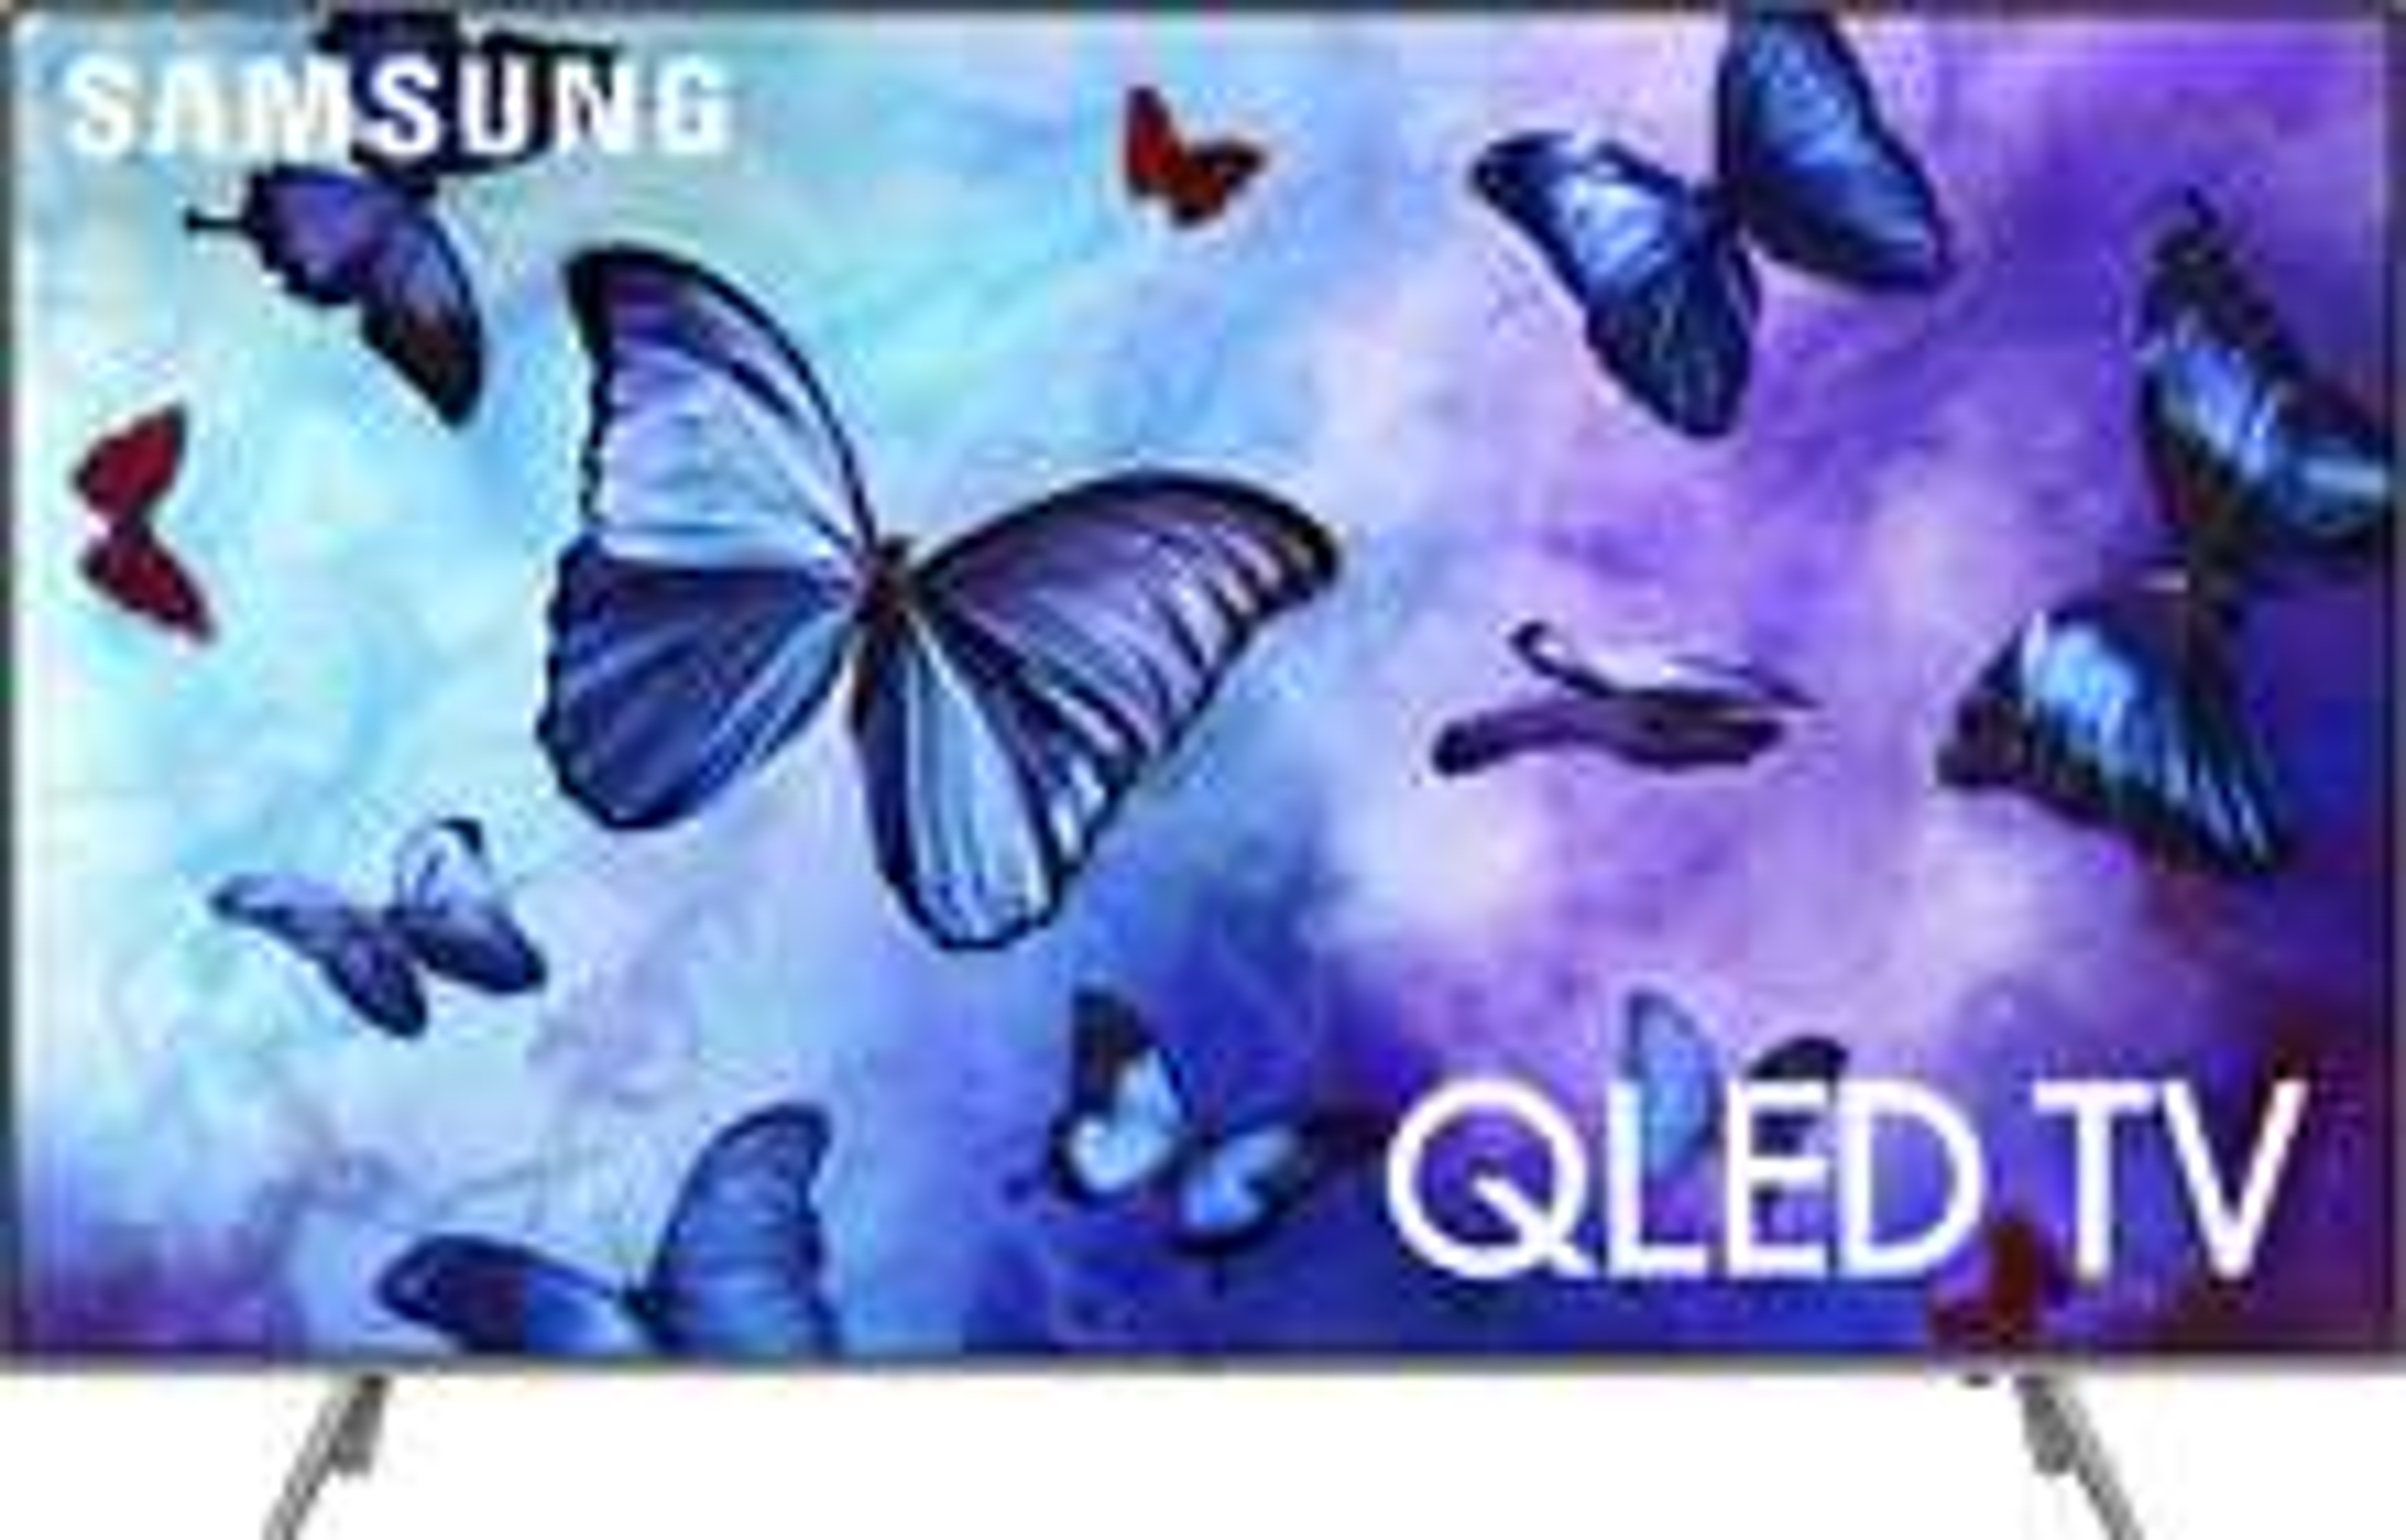 Image 5 for Samsung QN82Q6FNAFXZA